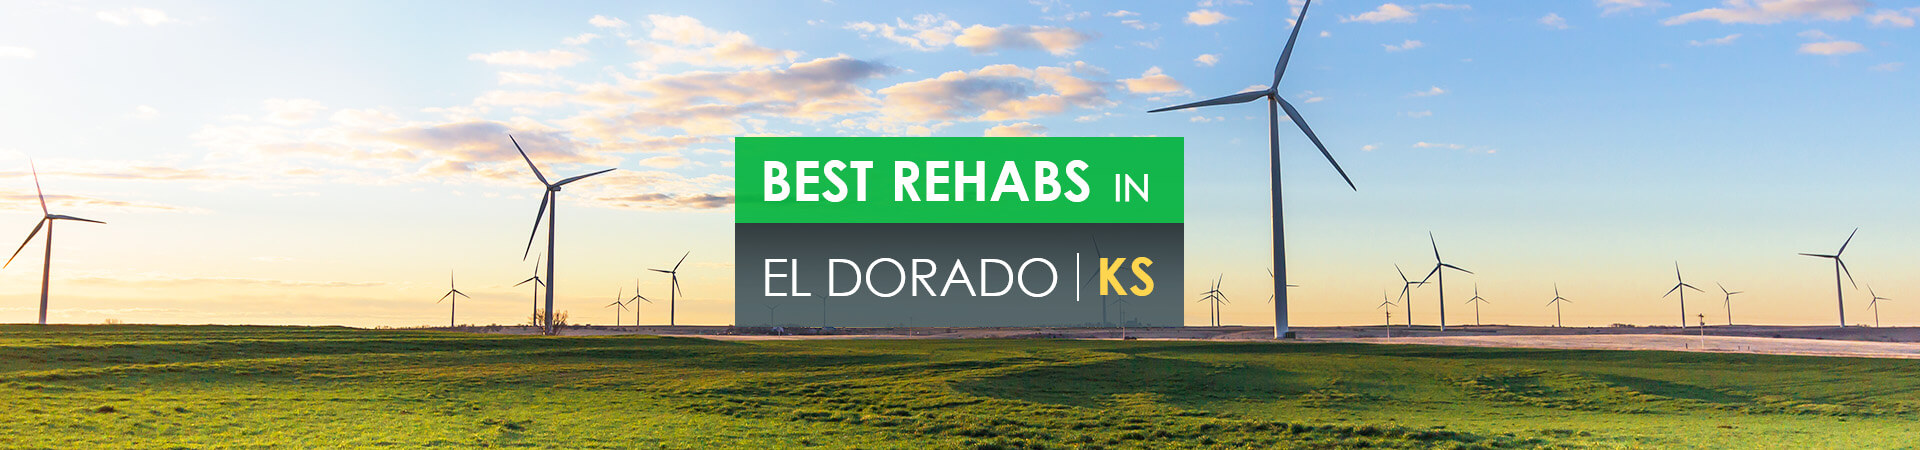 Best rehabs in El Dorado, KS